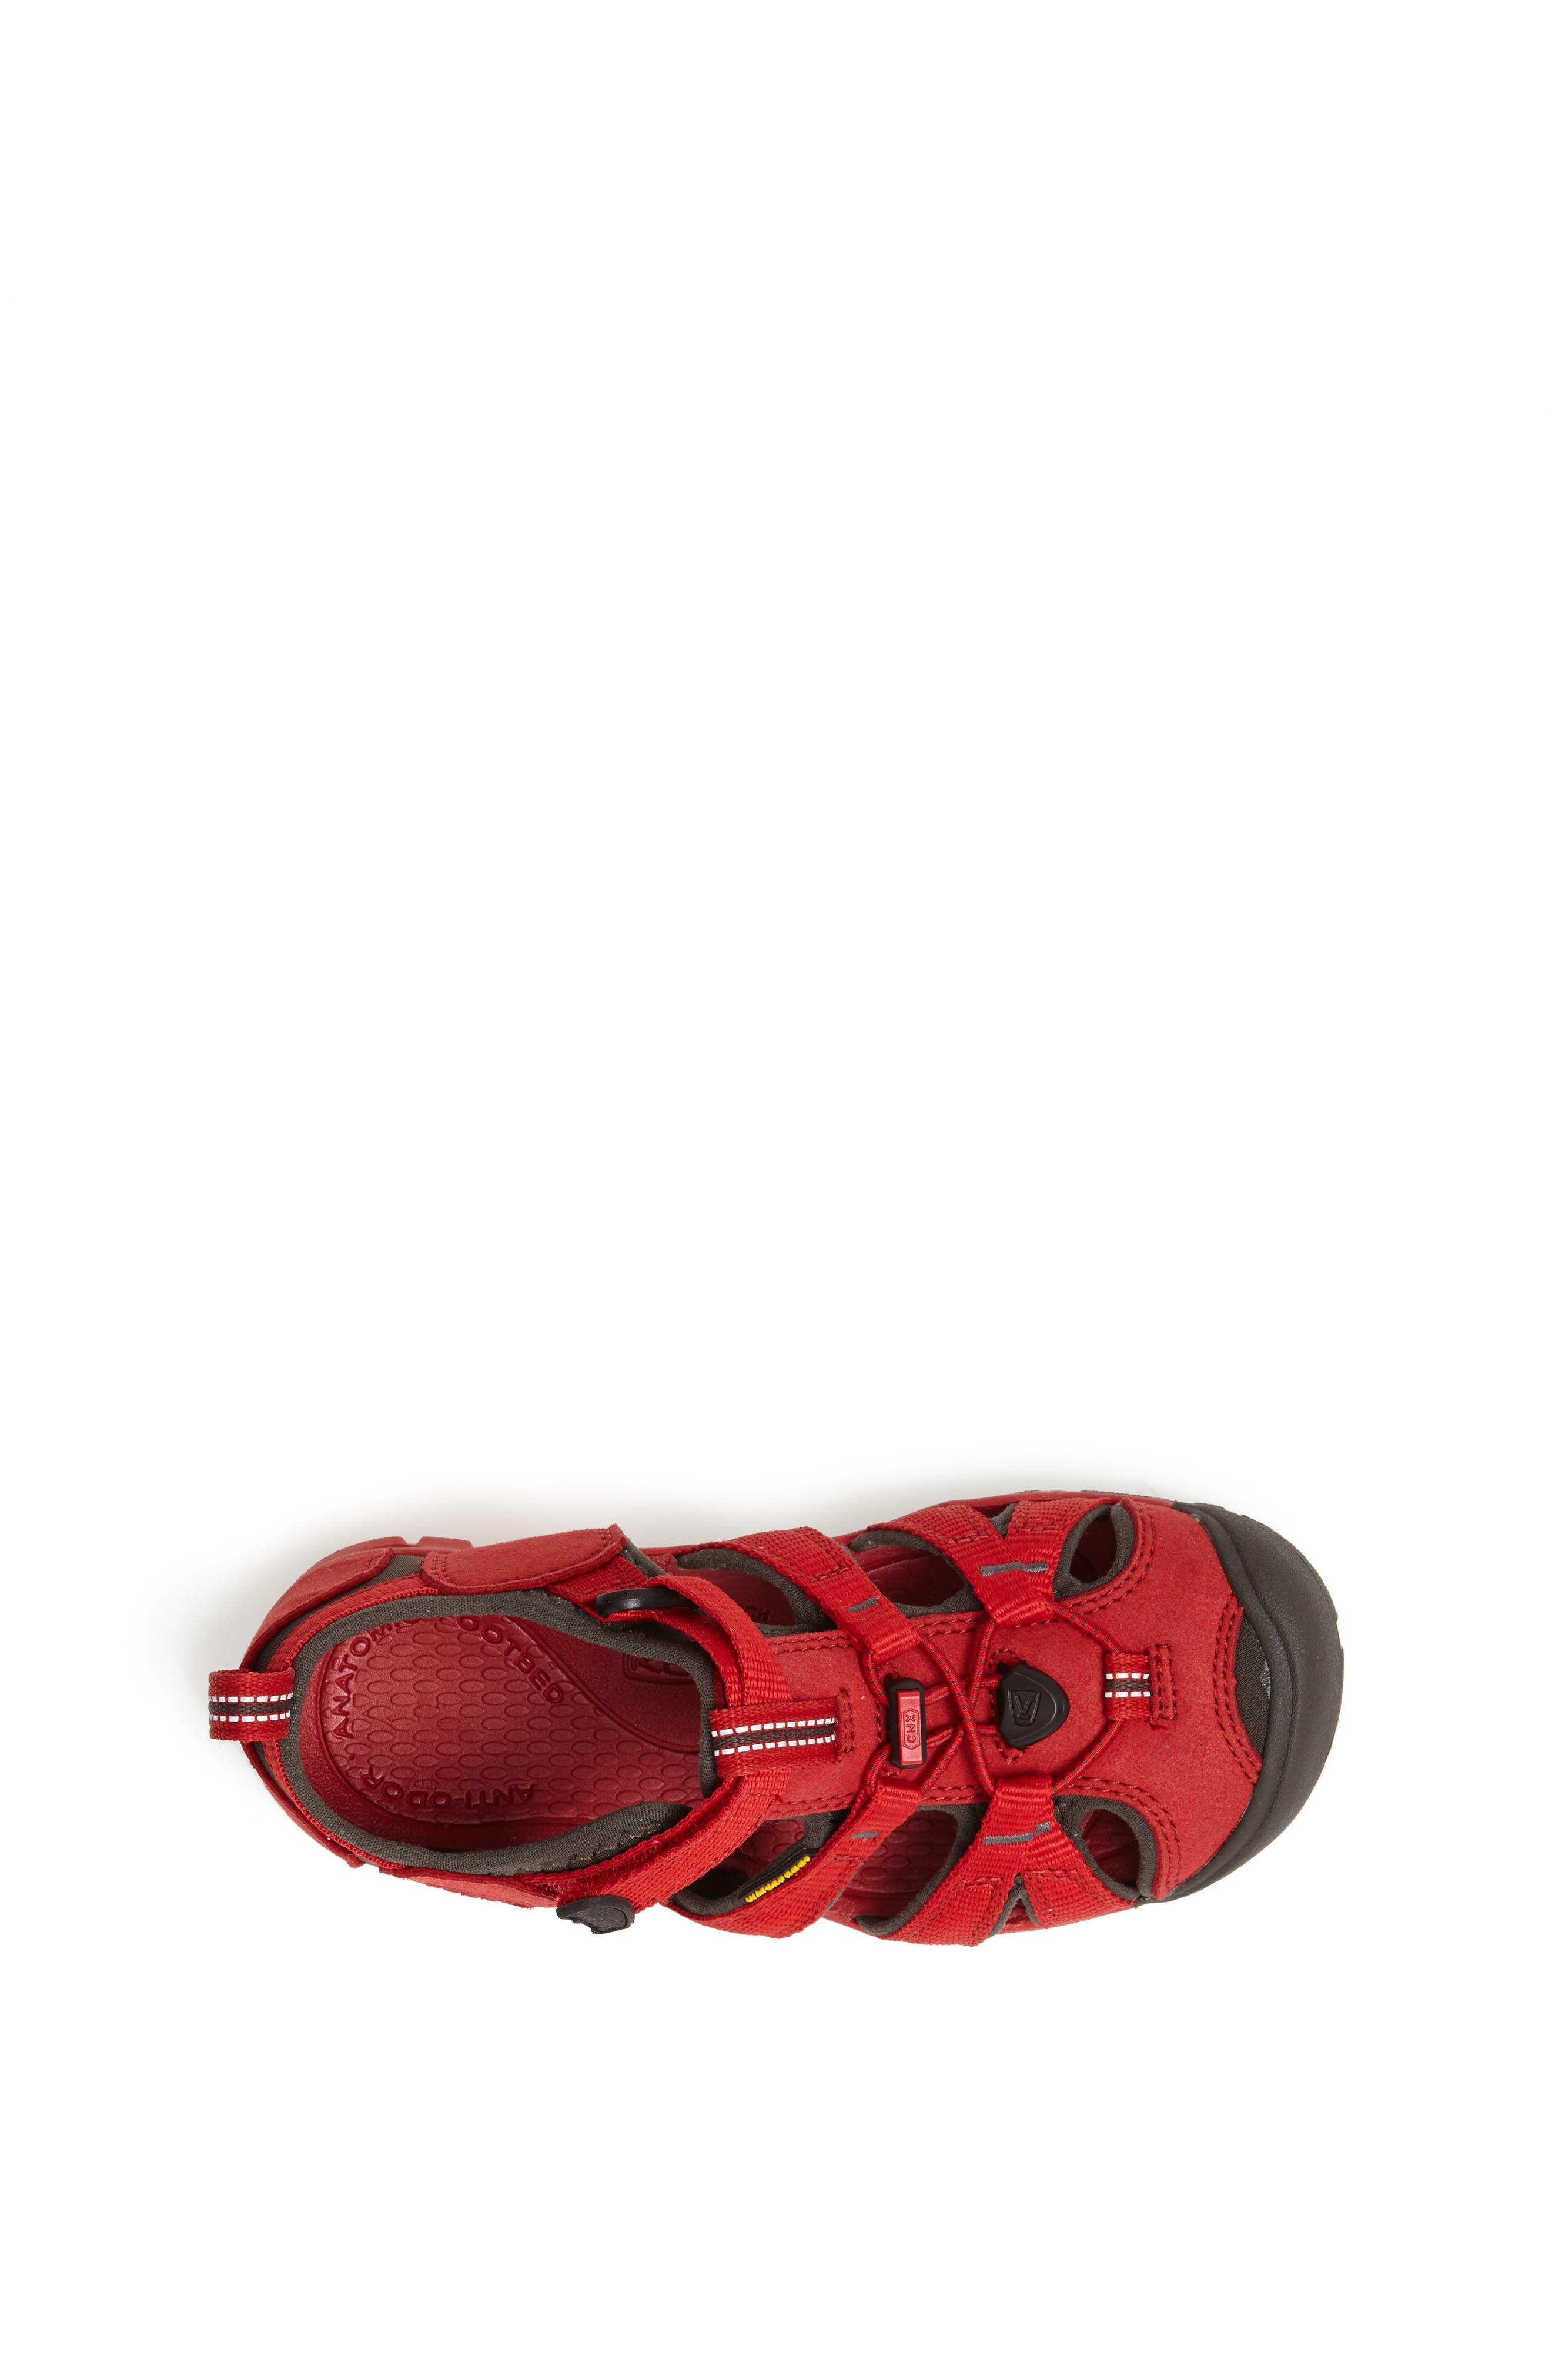 ,                             'Seacamp II' Water Friendly Sandal,                             Alternate thumbnail 240, color,                             604